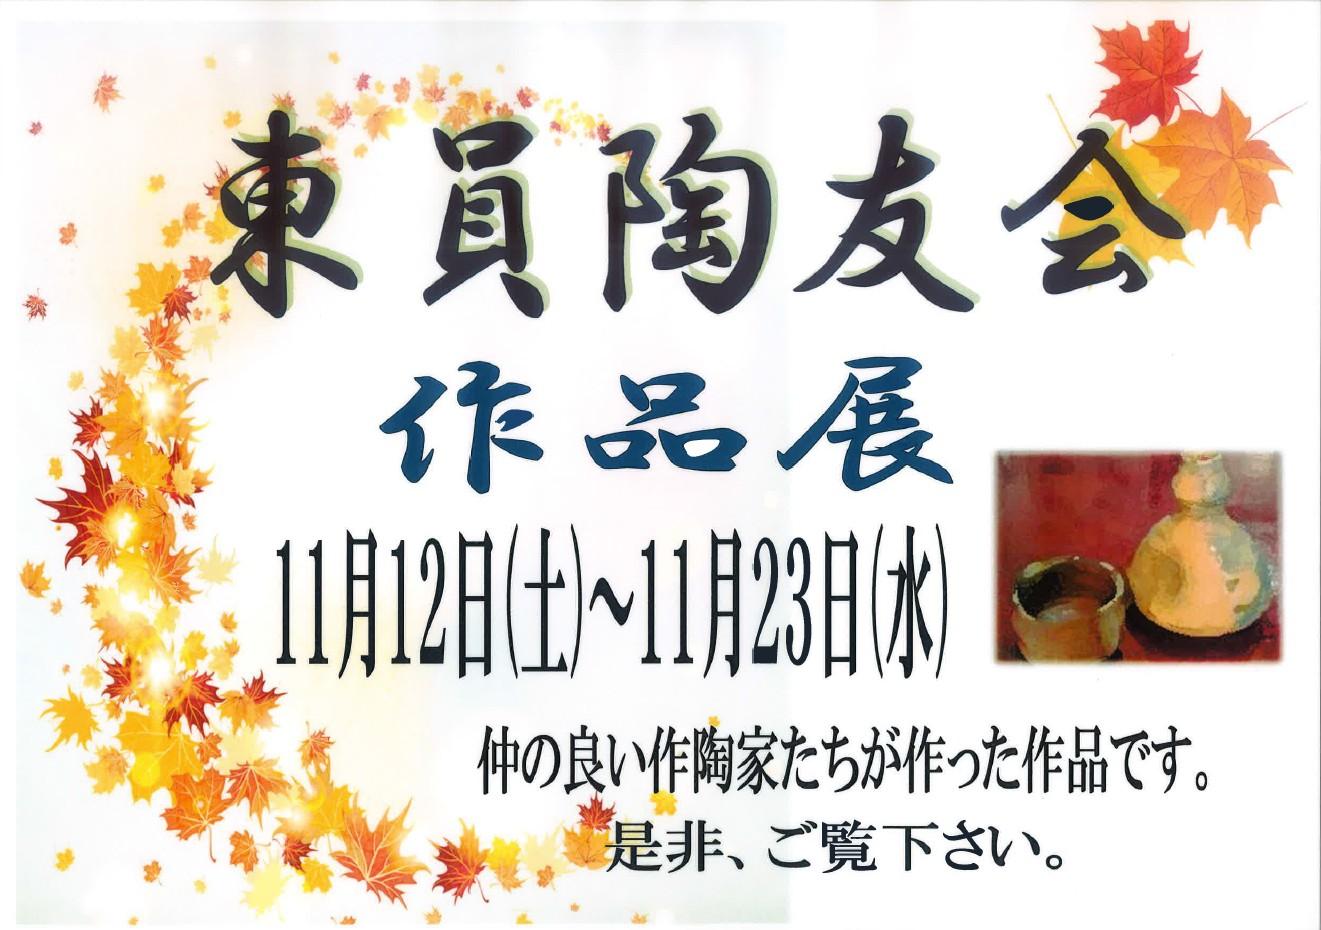 http://www.ajisainosato.com/info/images/2016y10m29d_145619558.jpg